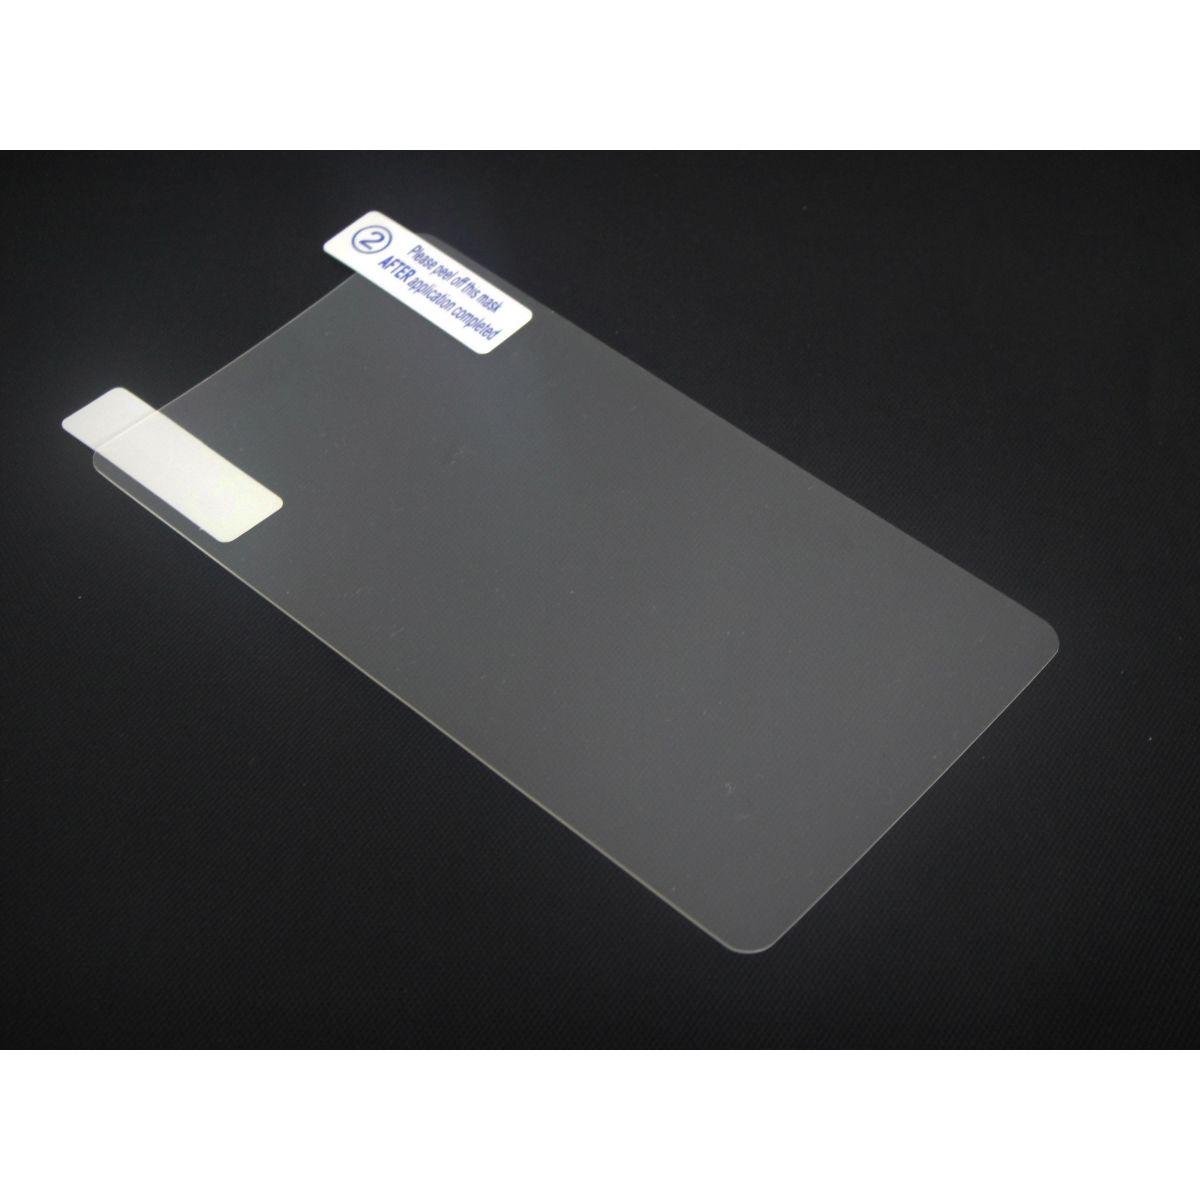 Película Protetora para CCE Motion Plus SK351 - Fosca